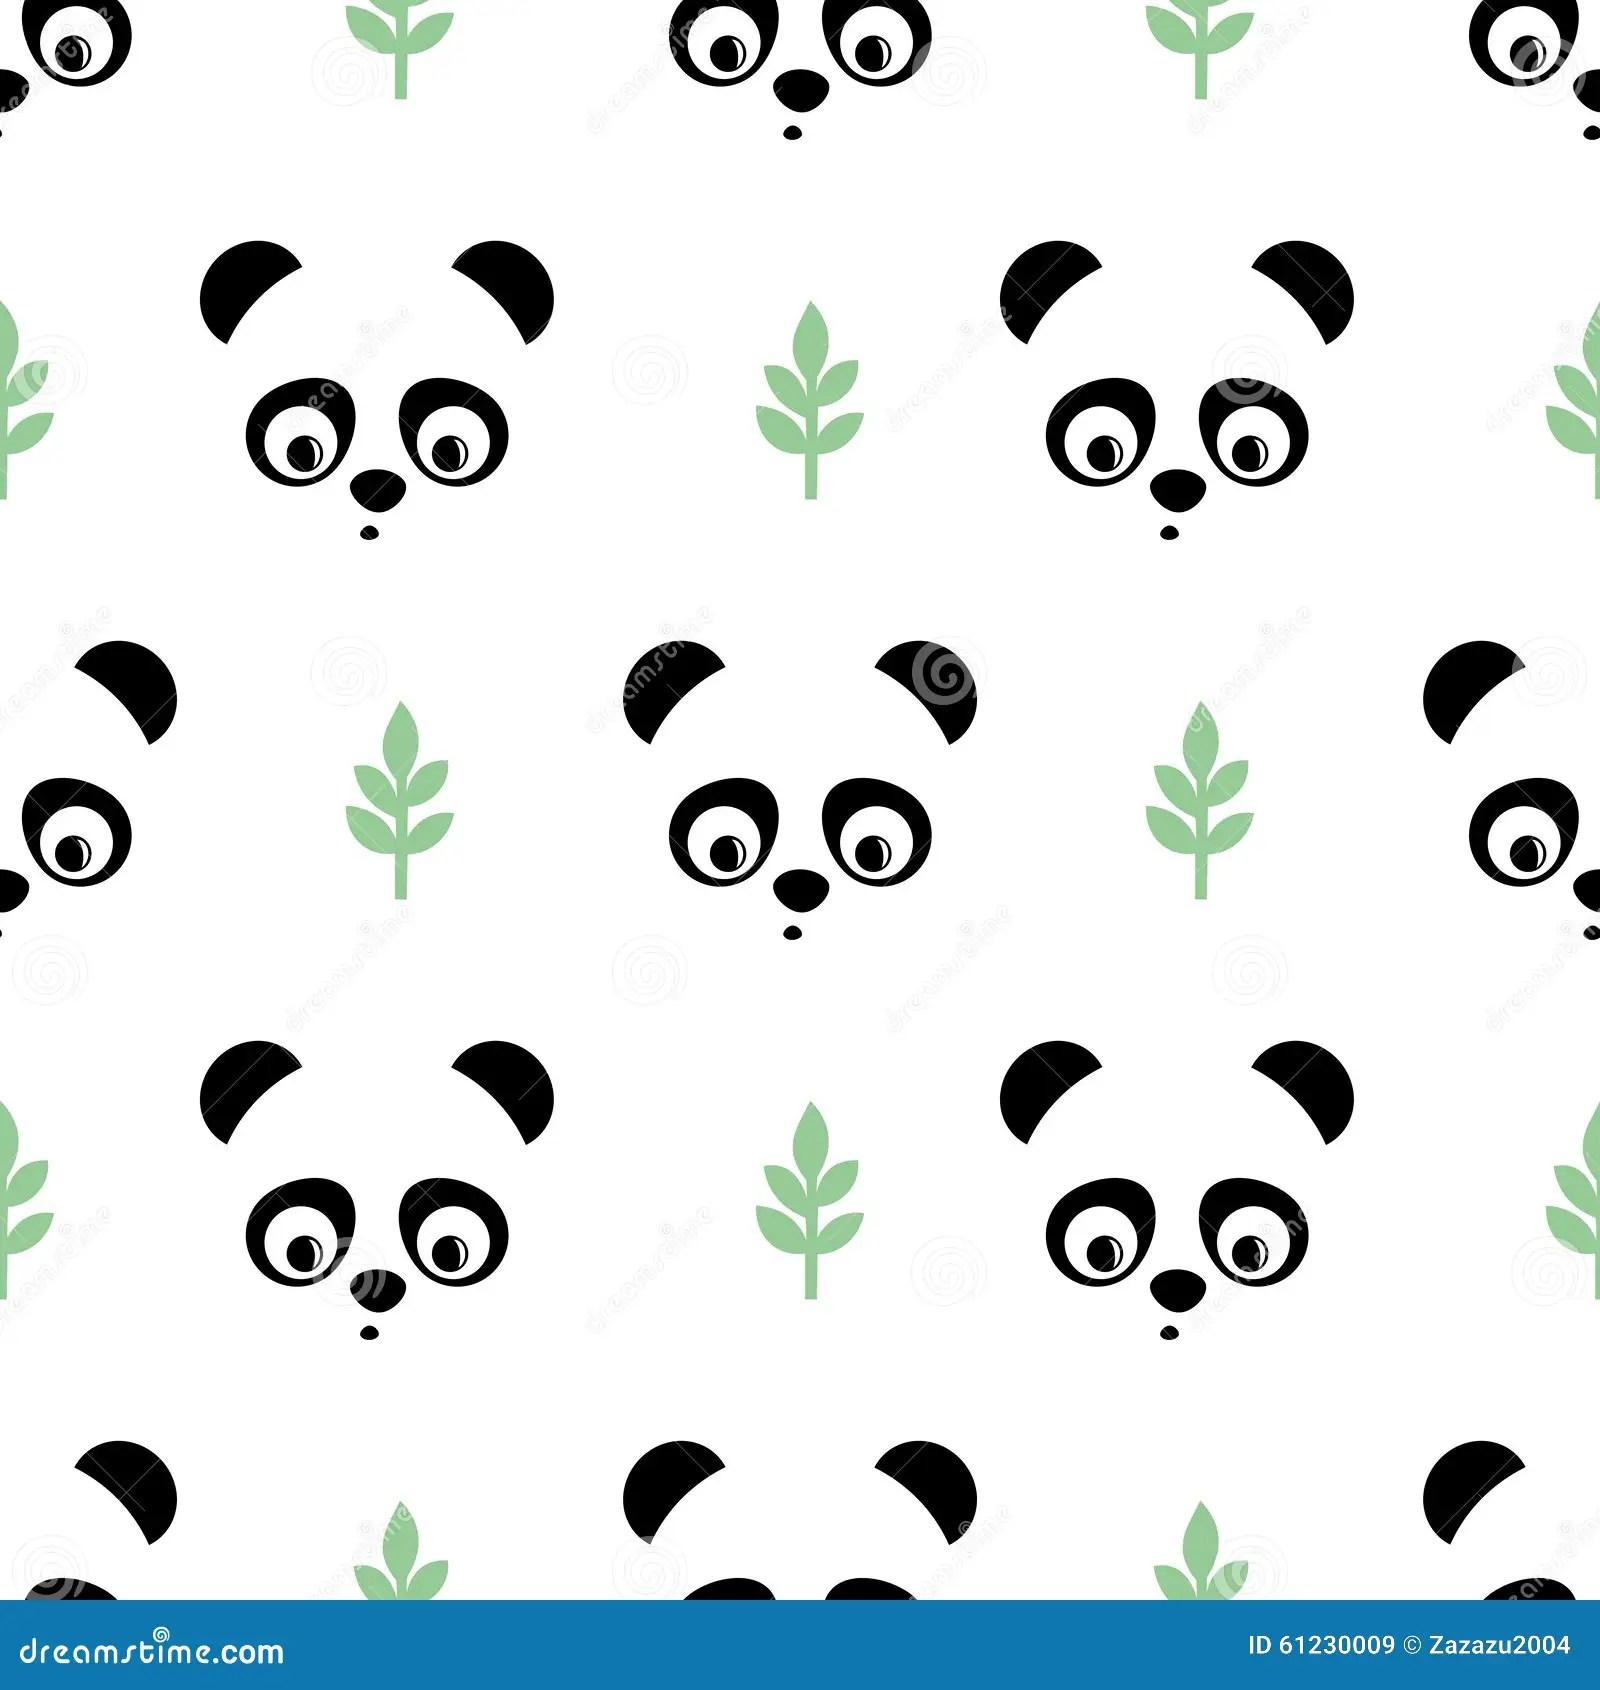 Starbucks Wallpaper Cute Panda Seamless Pattern With Green Twigs Cute Vector